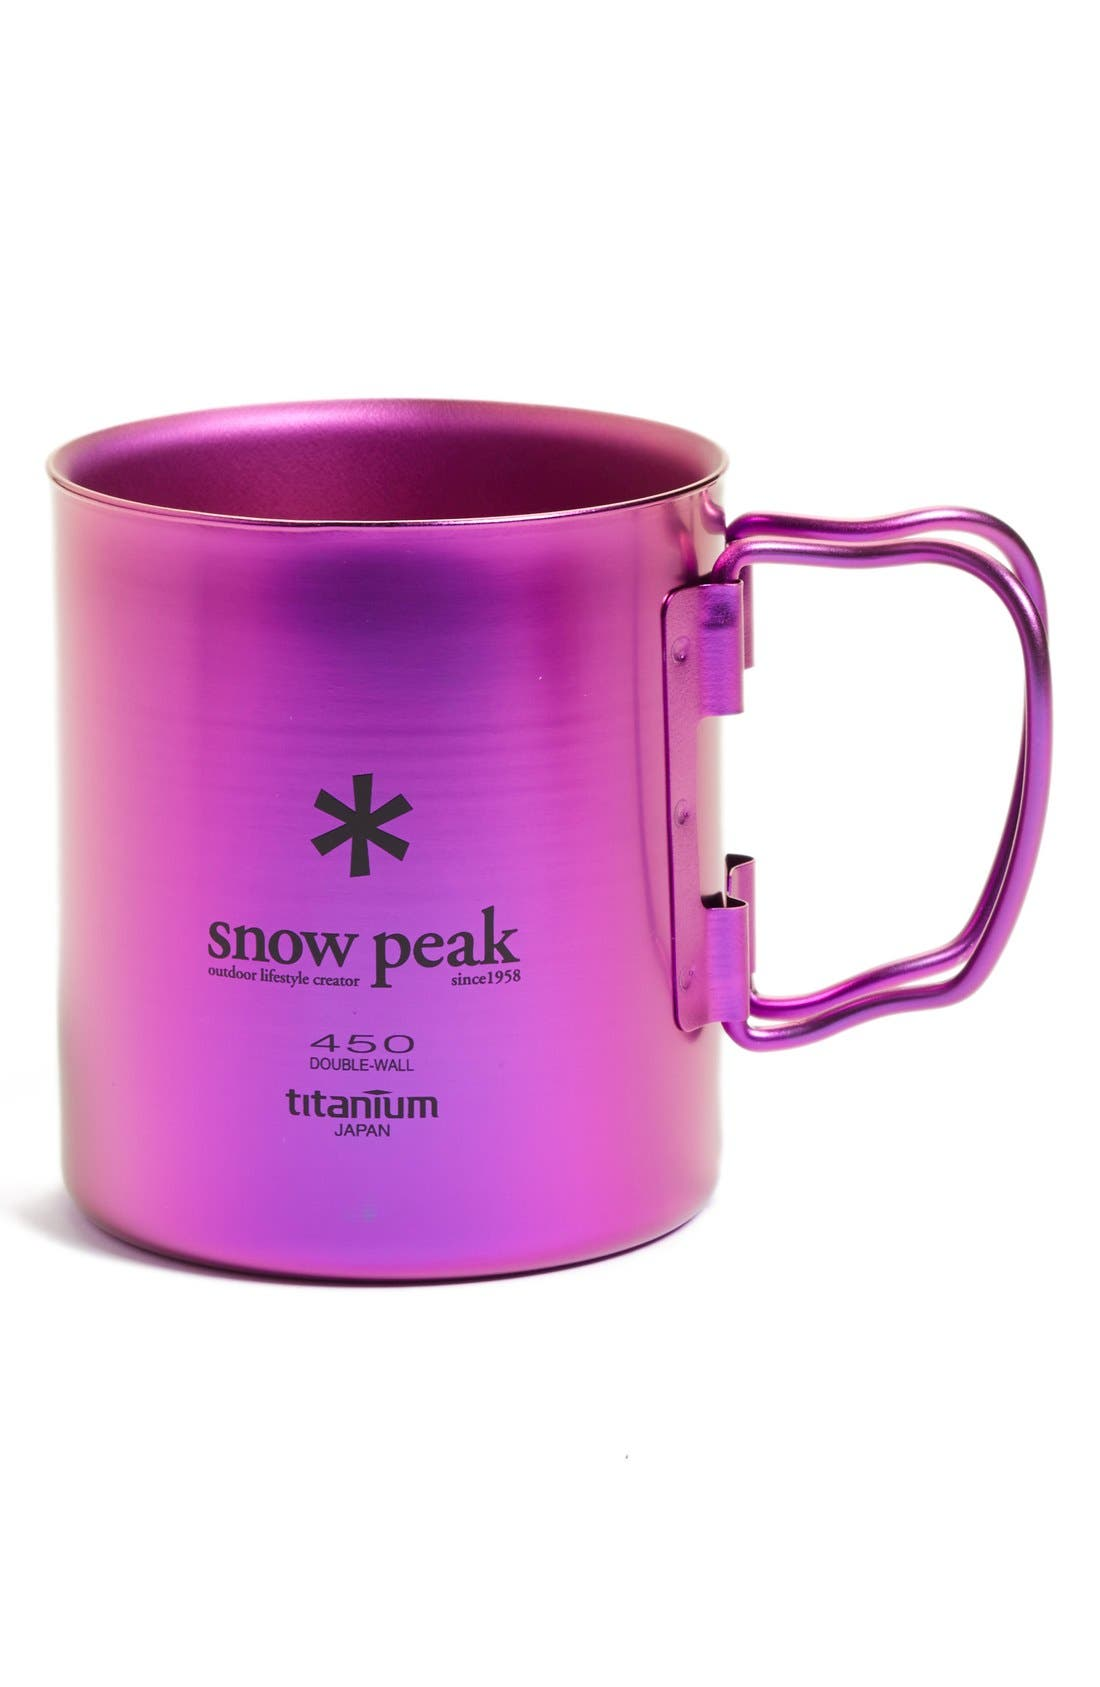 Main Image - Snow Peak 'Ti-Double 450' Insulated Titanium Camping Mug